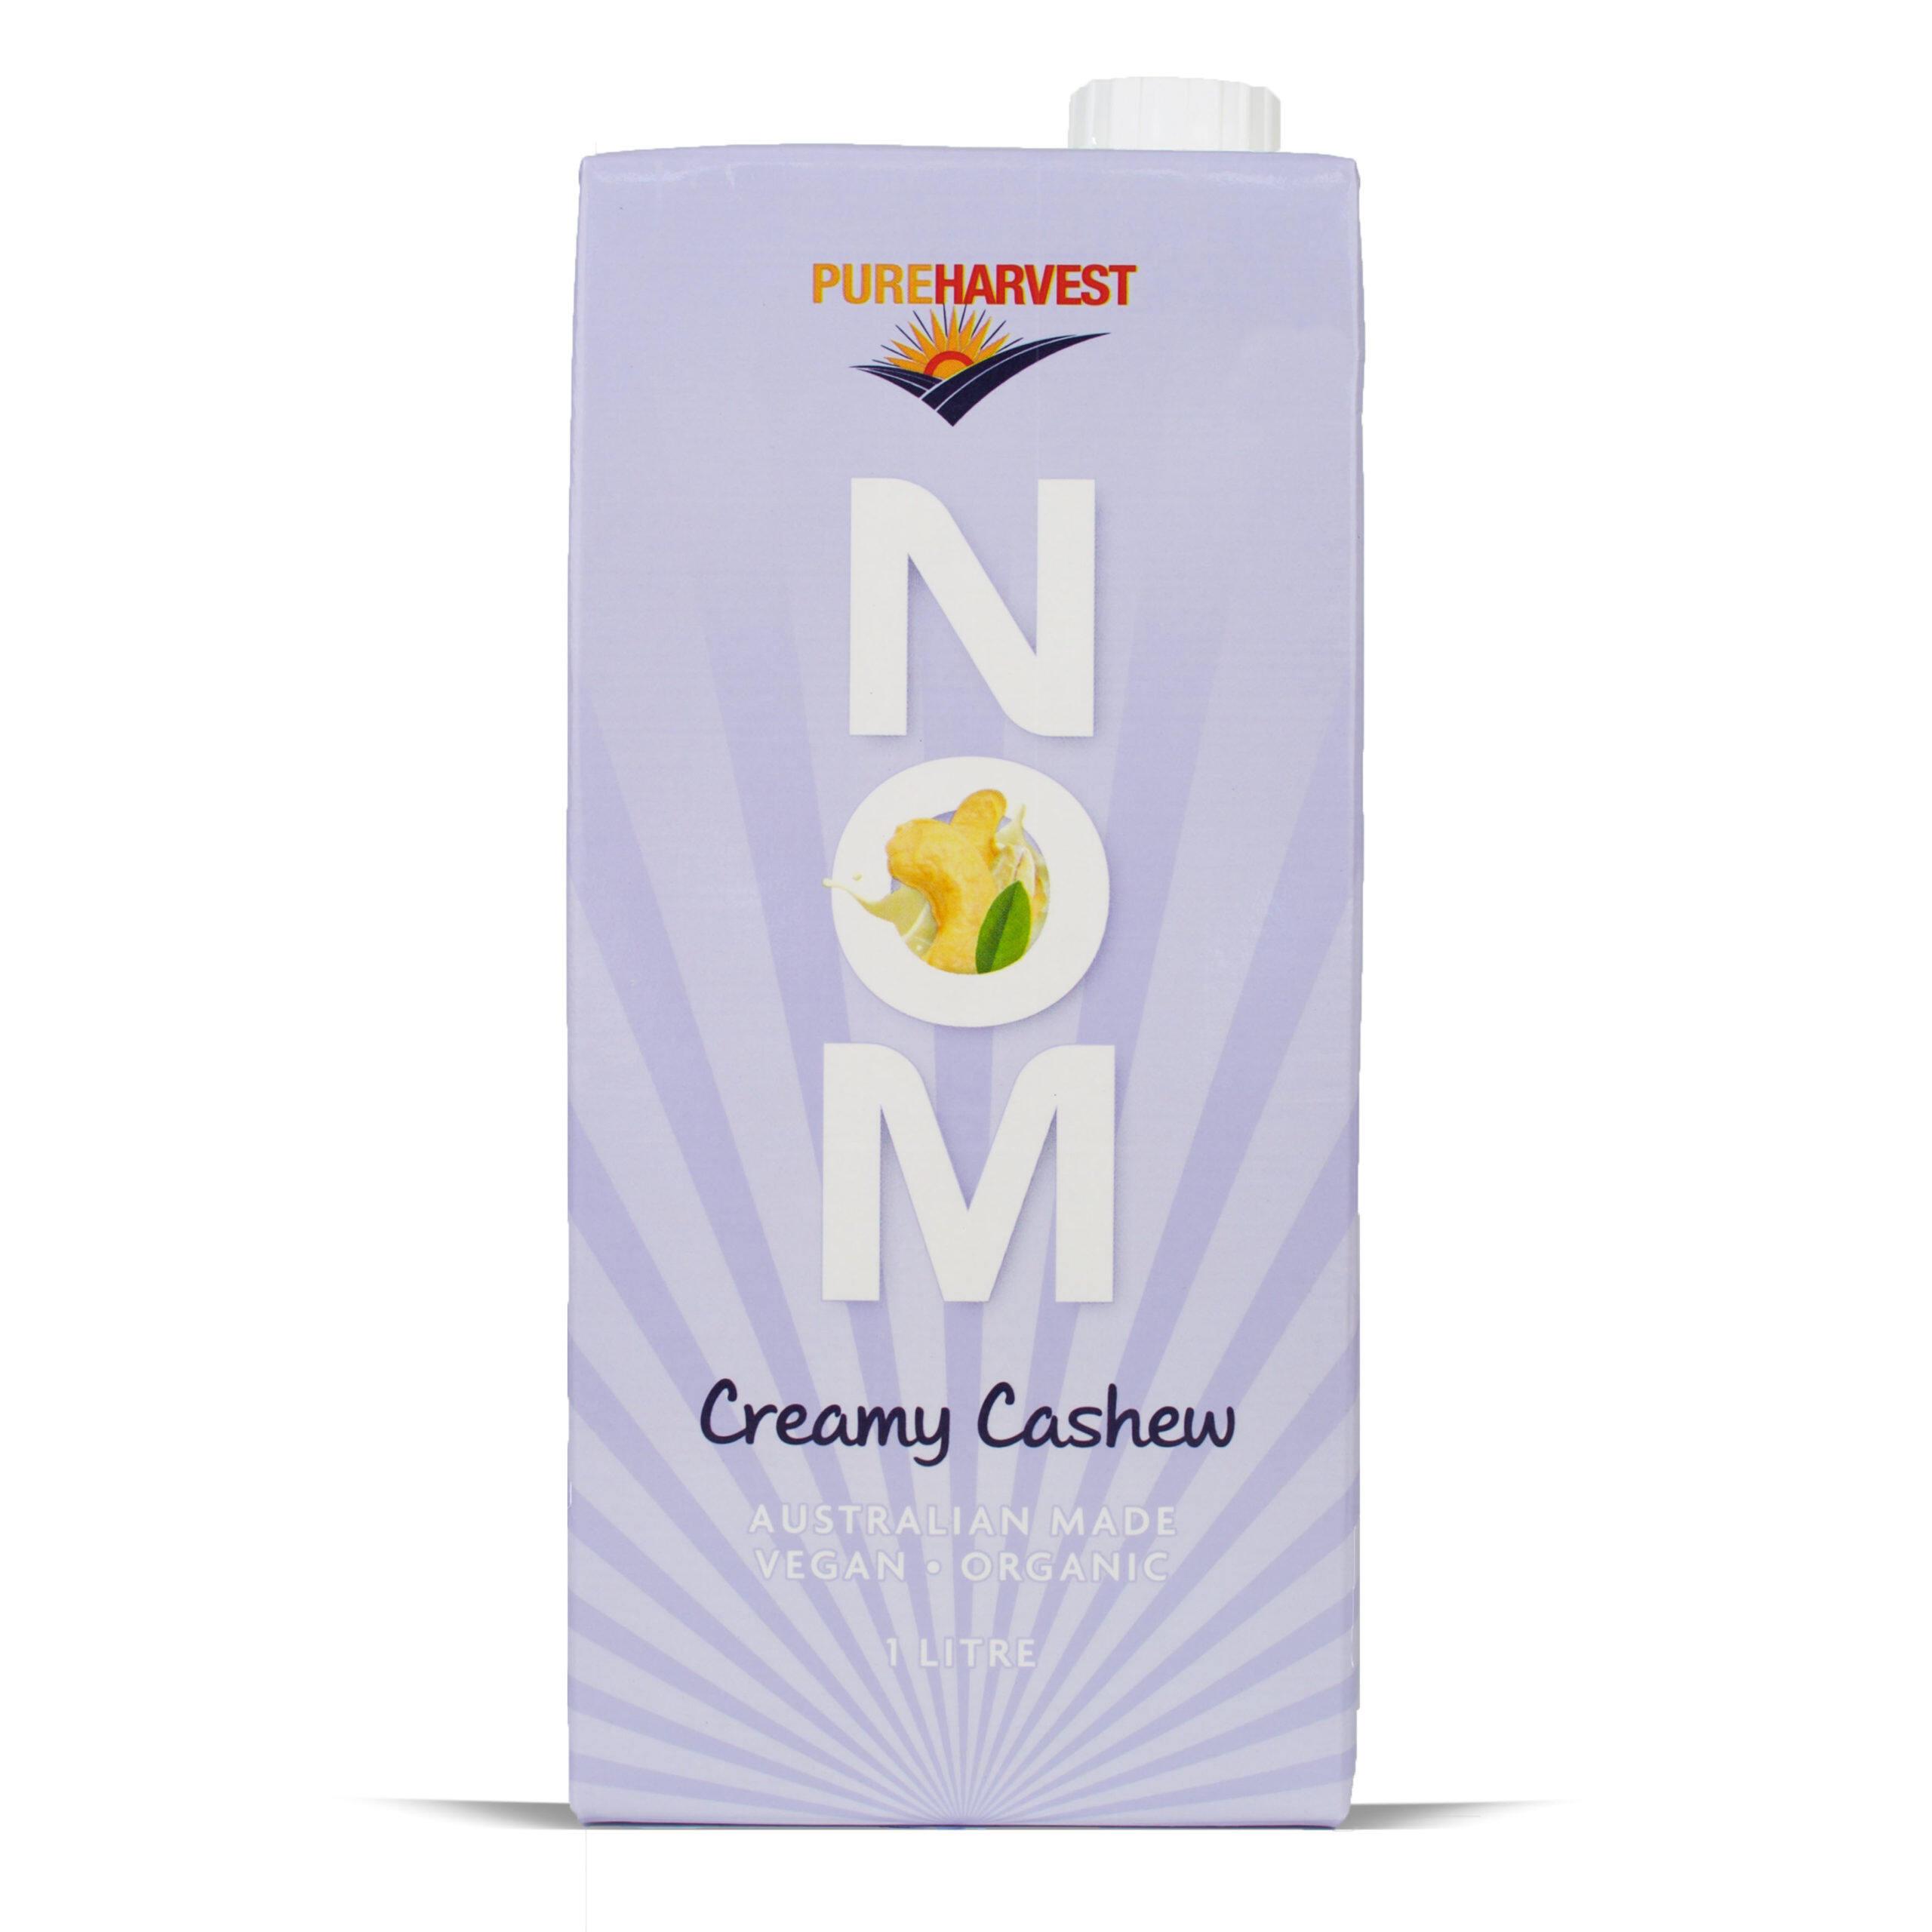 MILK PUREHARVEST NOM Creamy Cashew Australian Made Vegan Organic (1L) EURO SNACKS